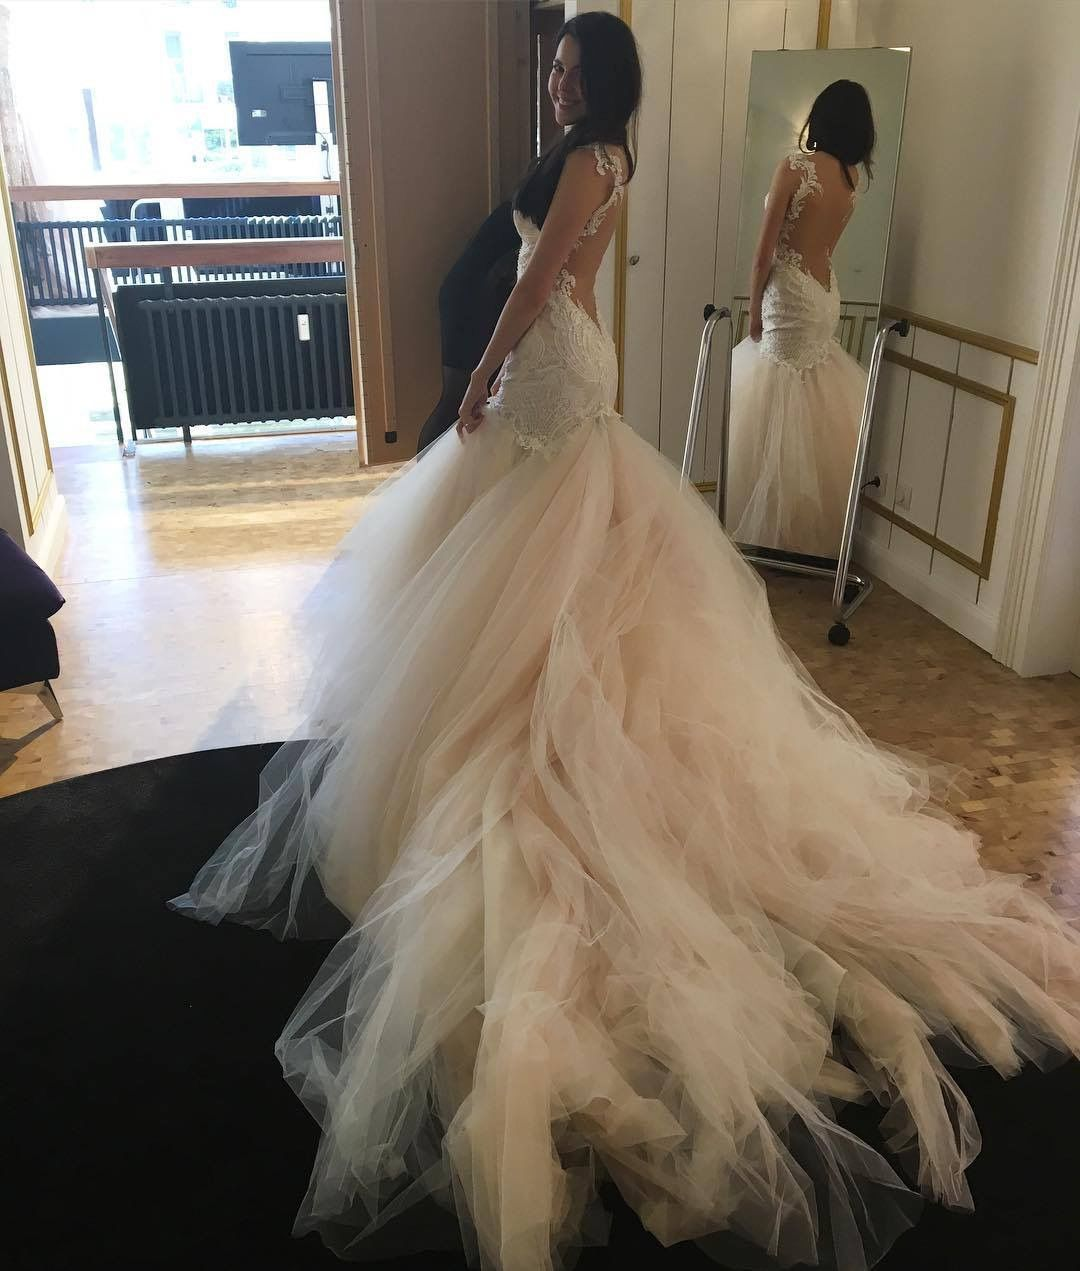 Wedding dresses stores  Pin by Nicole Marie on Future Wedding Ideas uc  Pinterest  Wedding